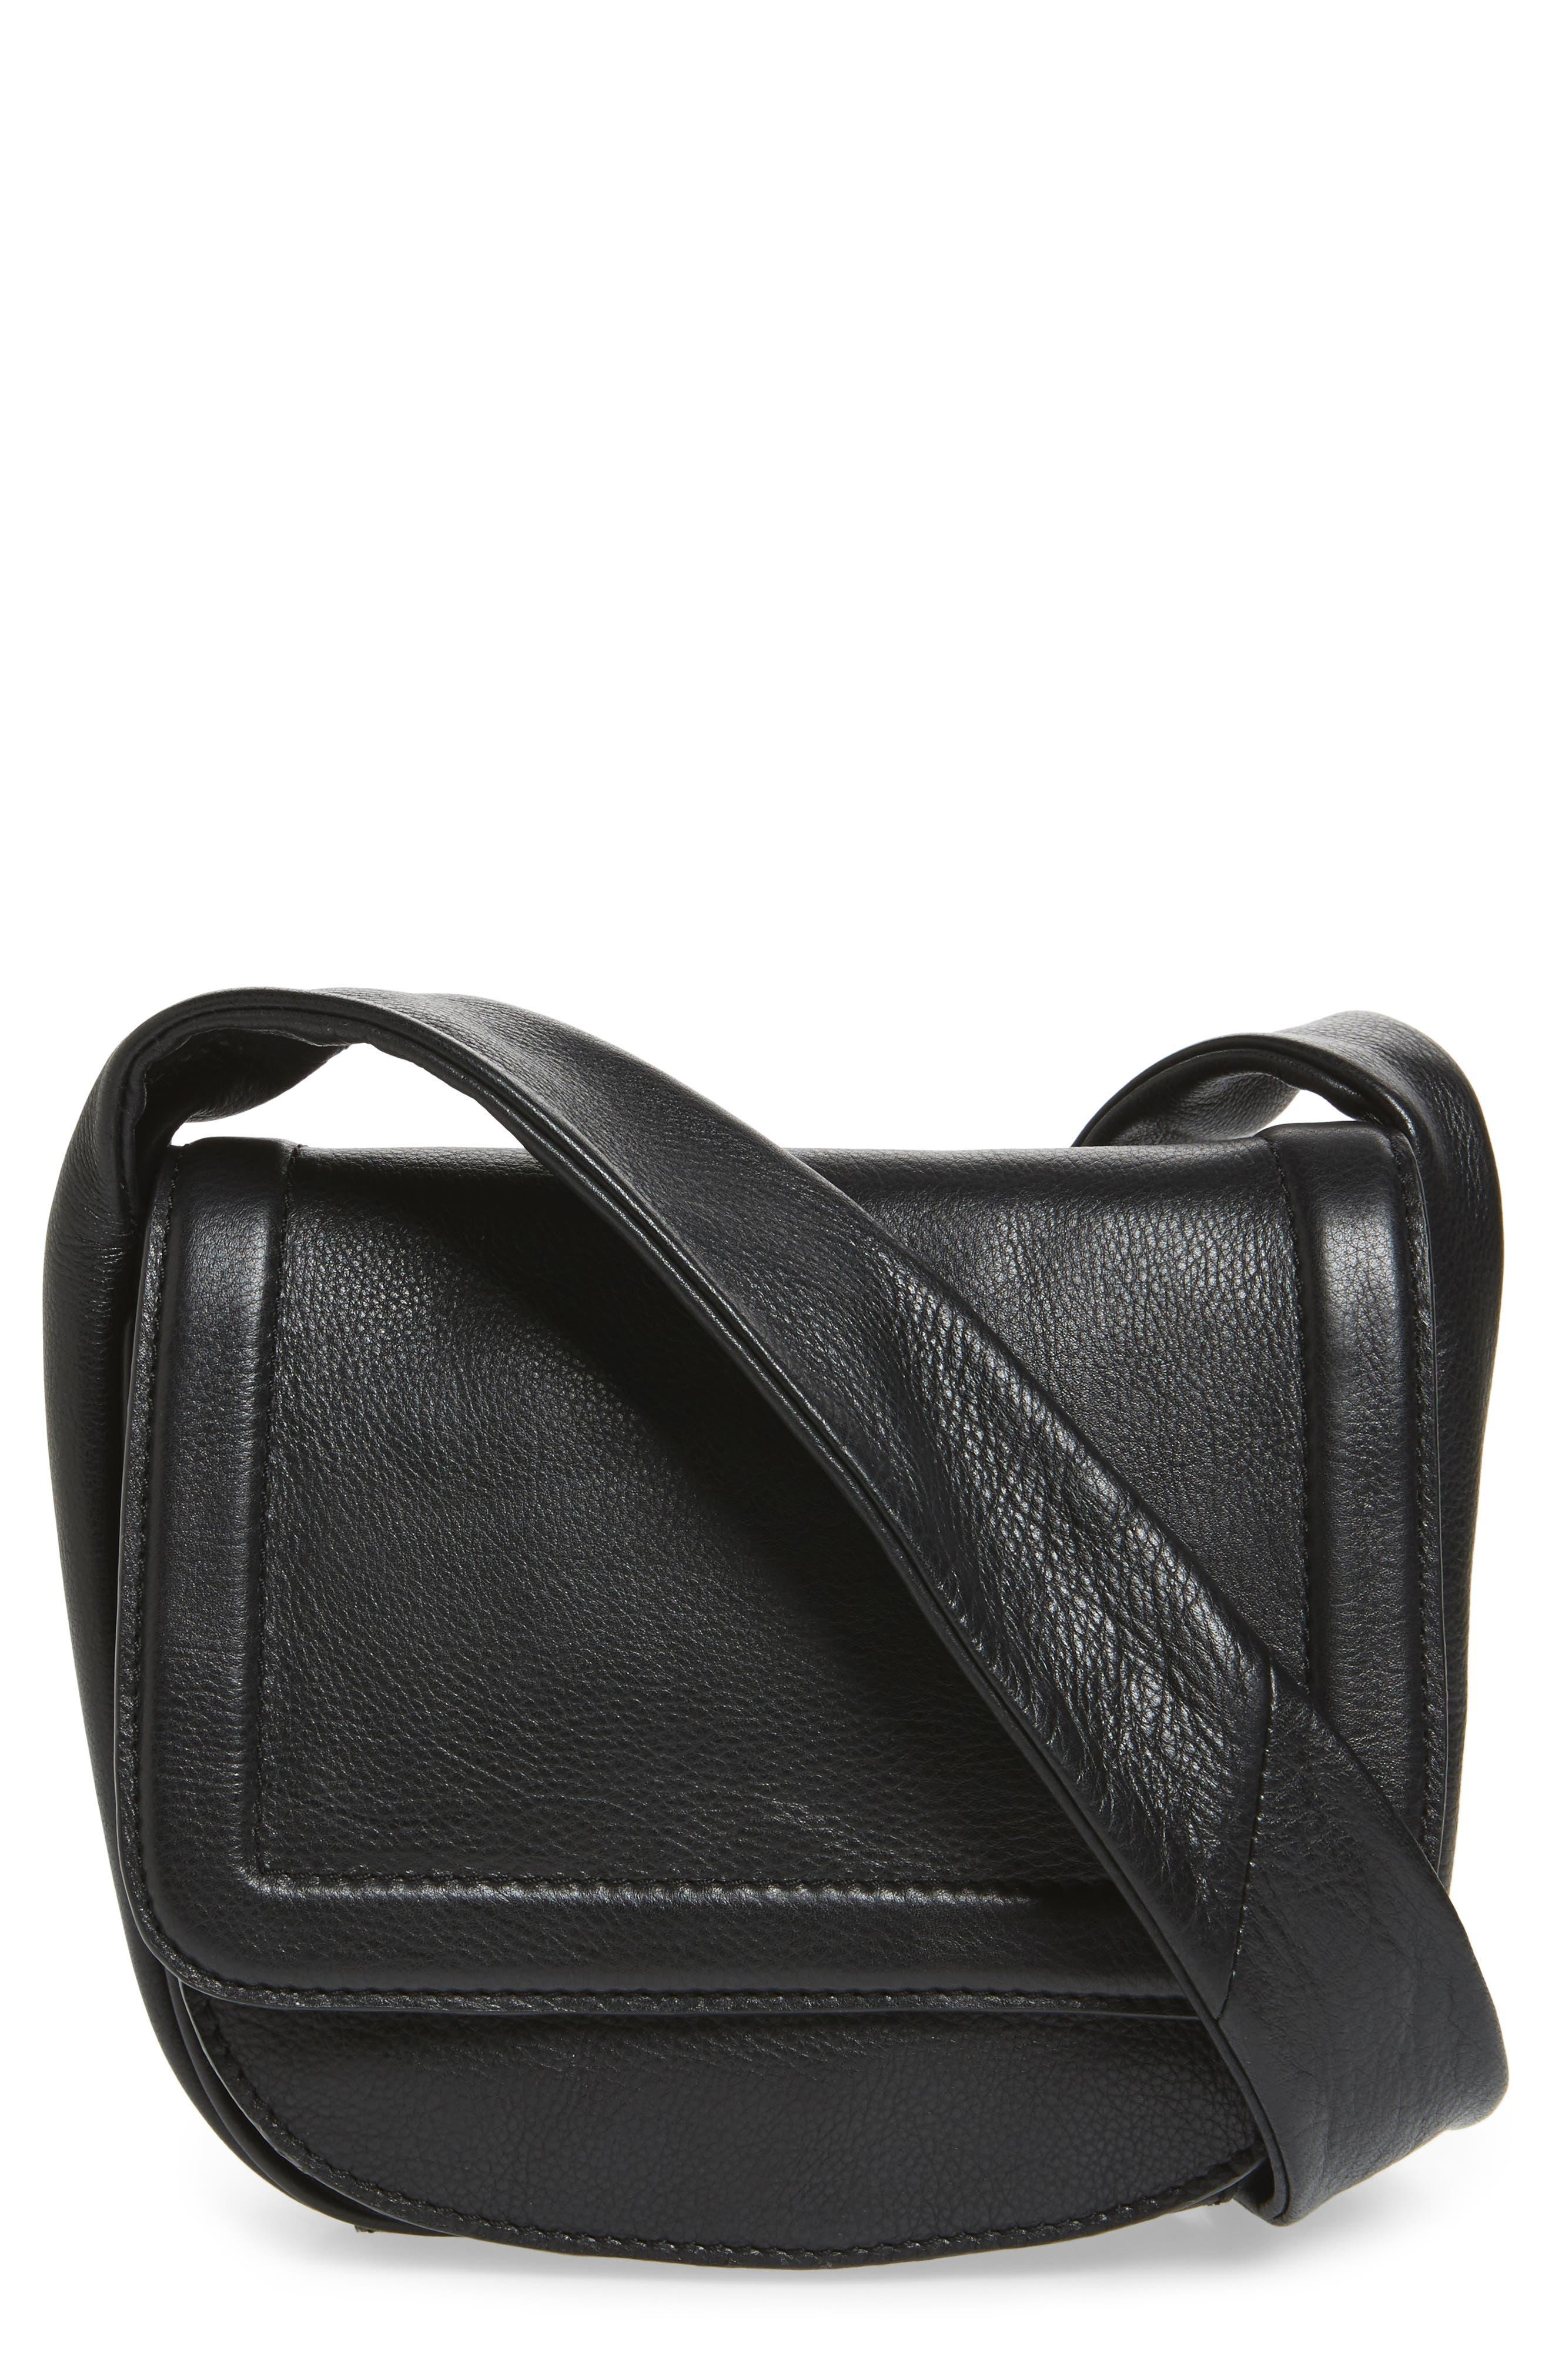 Jasmine Leather Saddle Bag,                         Main,                         color, Black